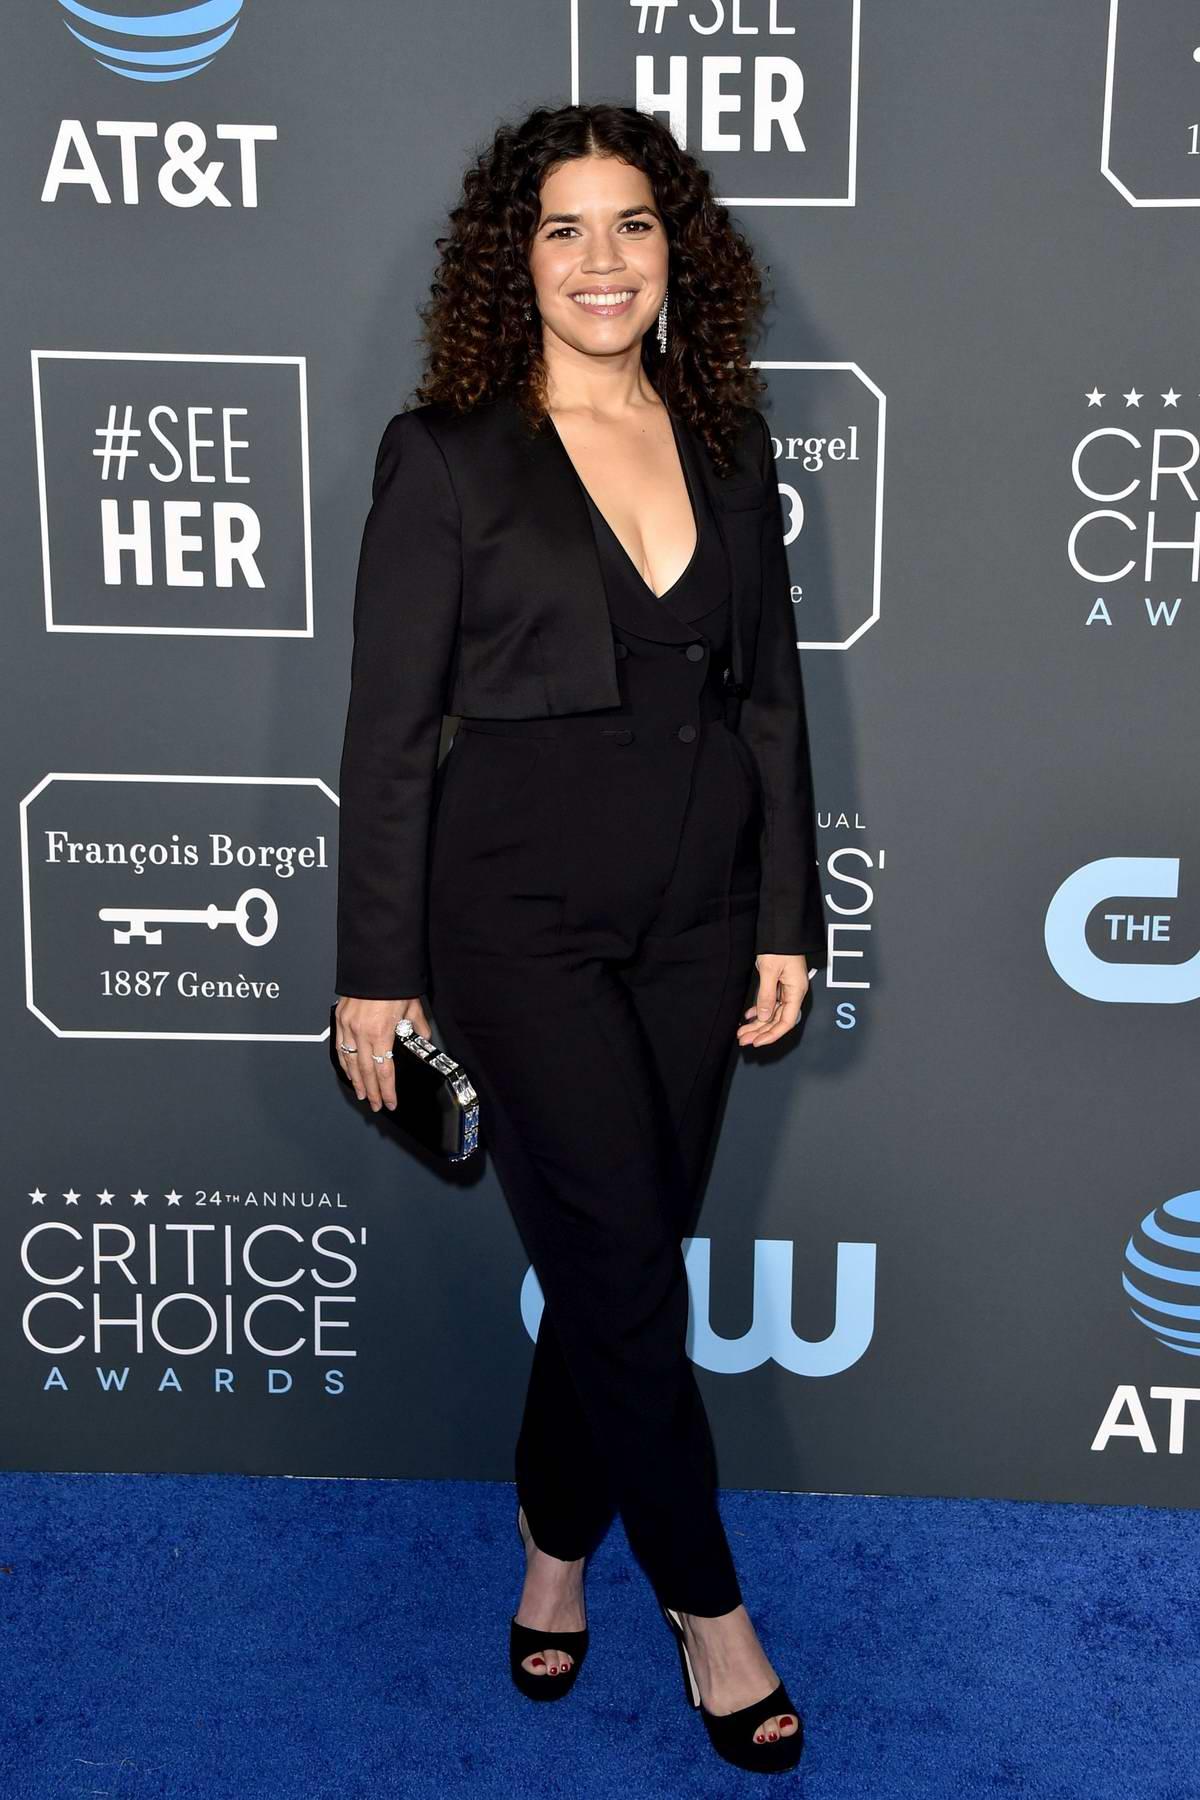 America Farrera attends the 24th Annual Critics' Choice Awards at Barker Hangar in Santa Monica, California